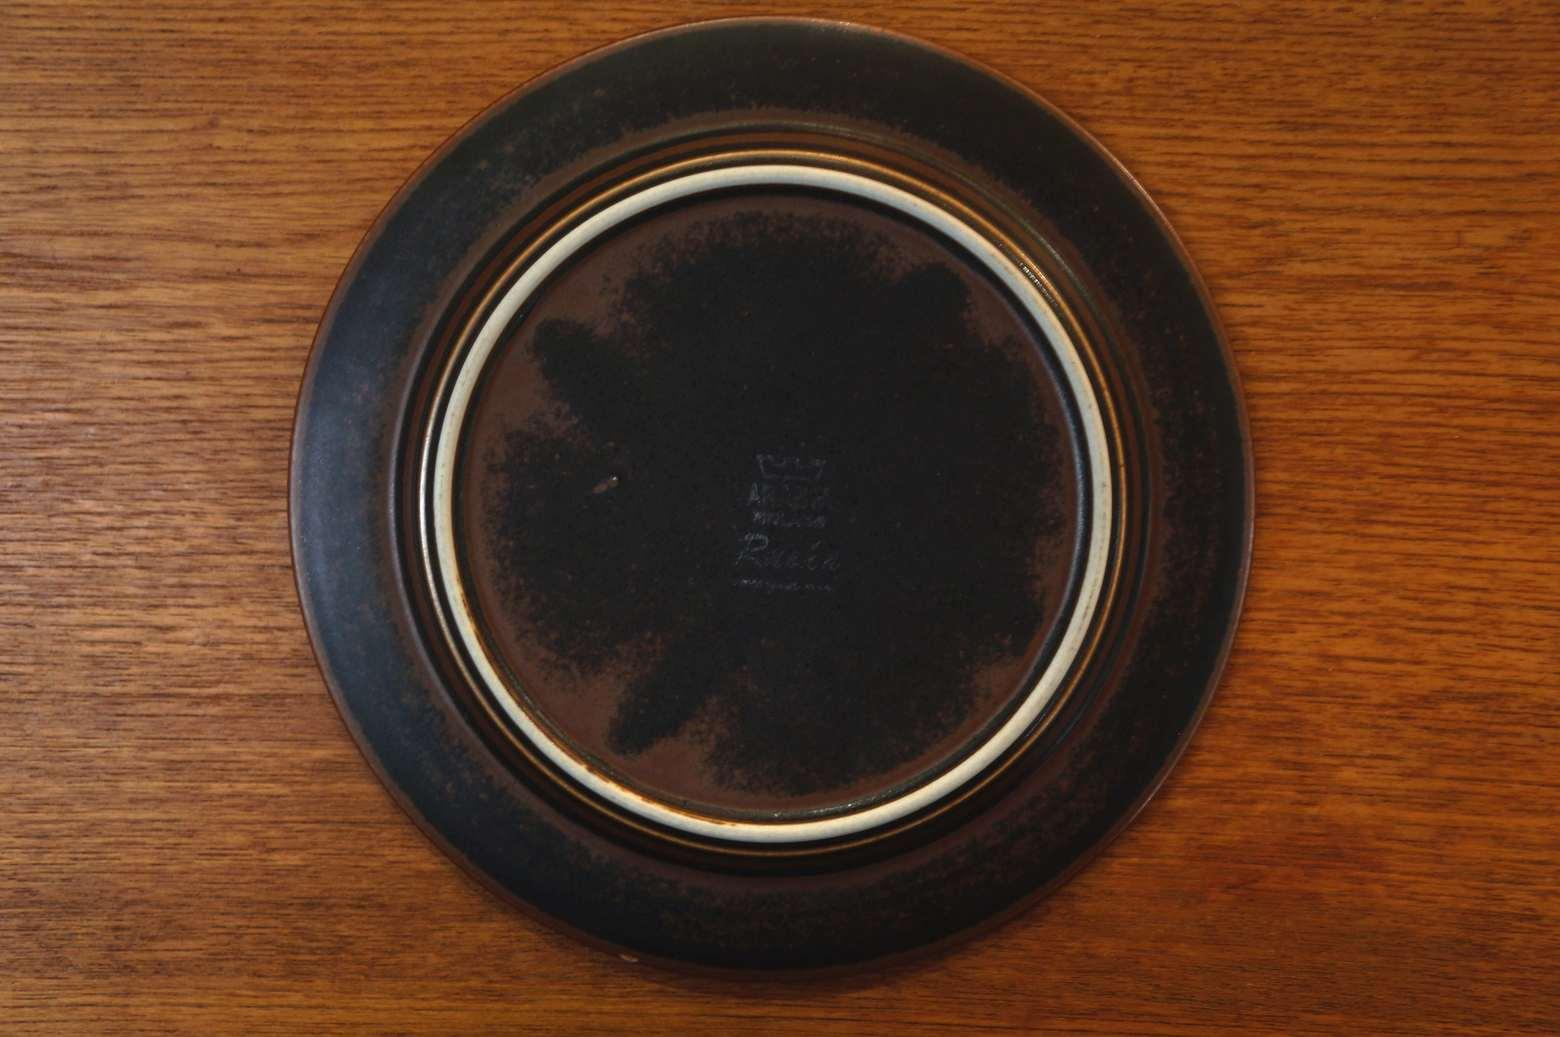 ARABIA Ruska Plate 20cm/アラビア ルスカ プレート 20cm 2